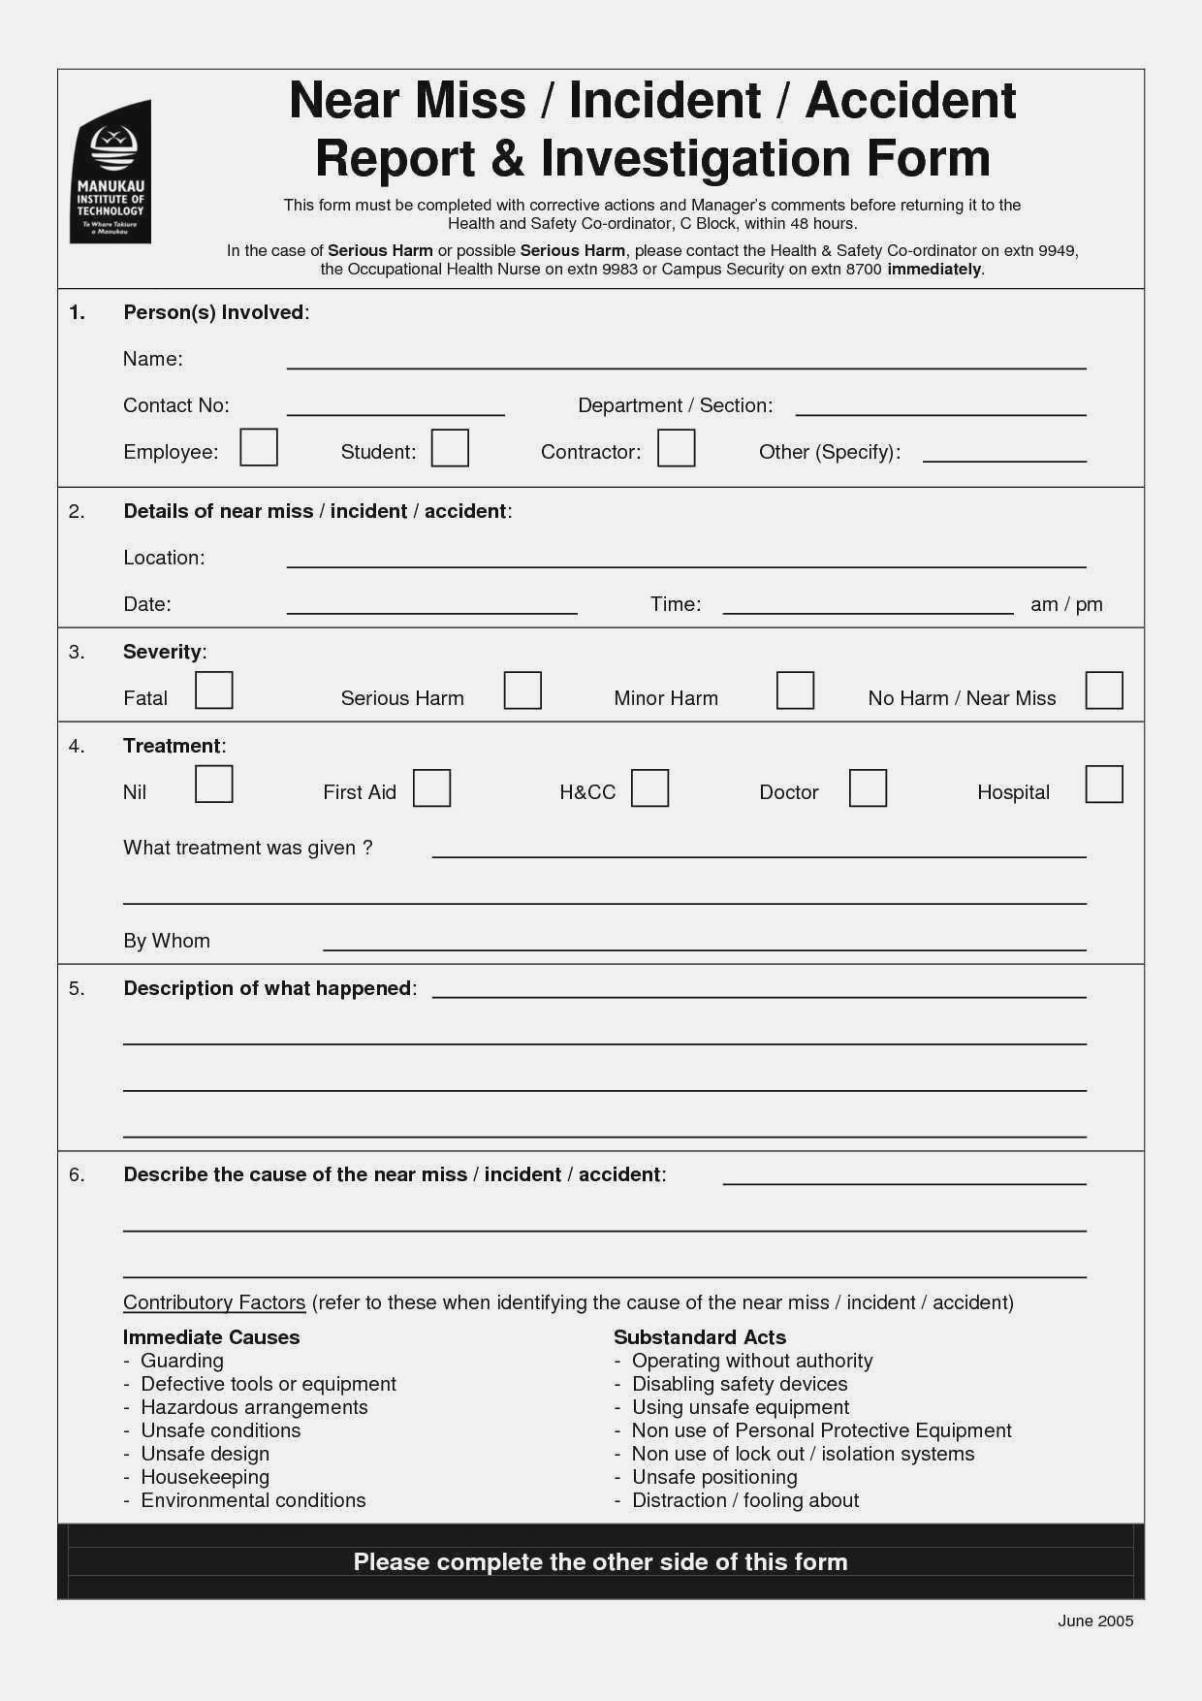 Osha Safety Incident Report Form  Sansurabionetassociats Inside Near Miss Incident Report Template